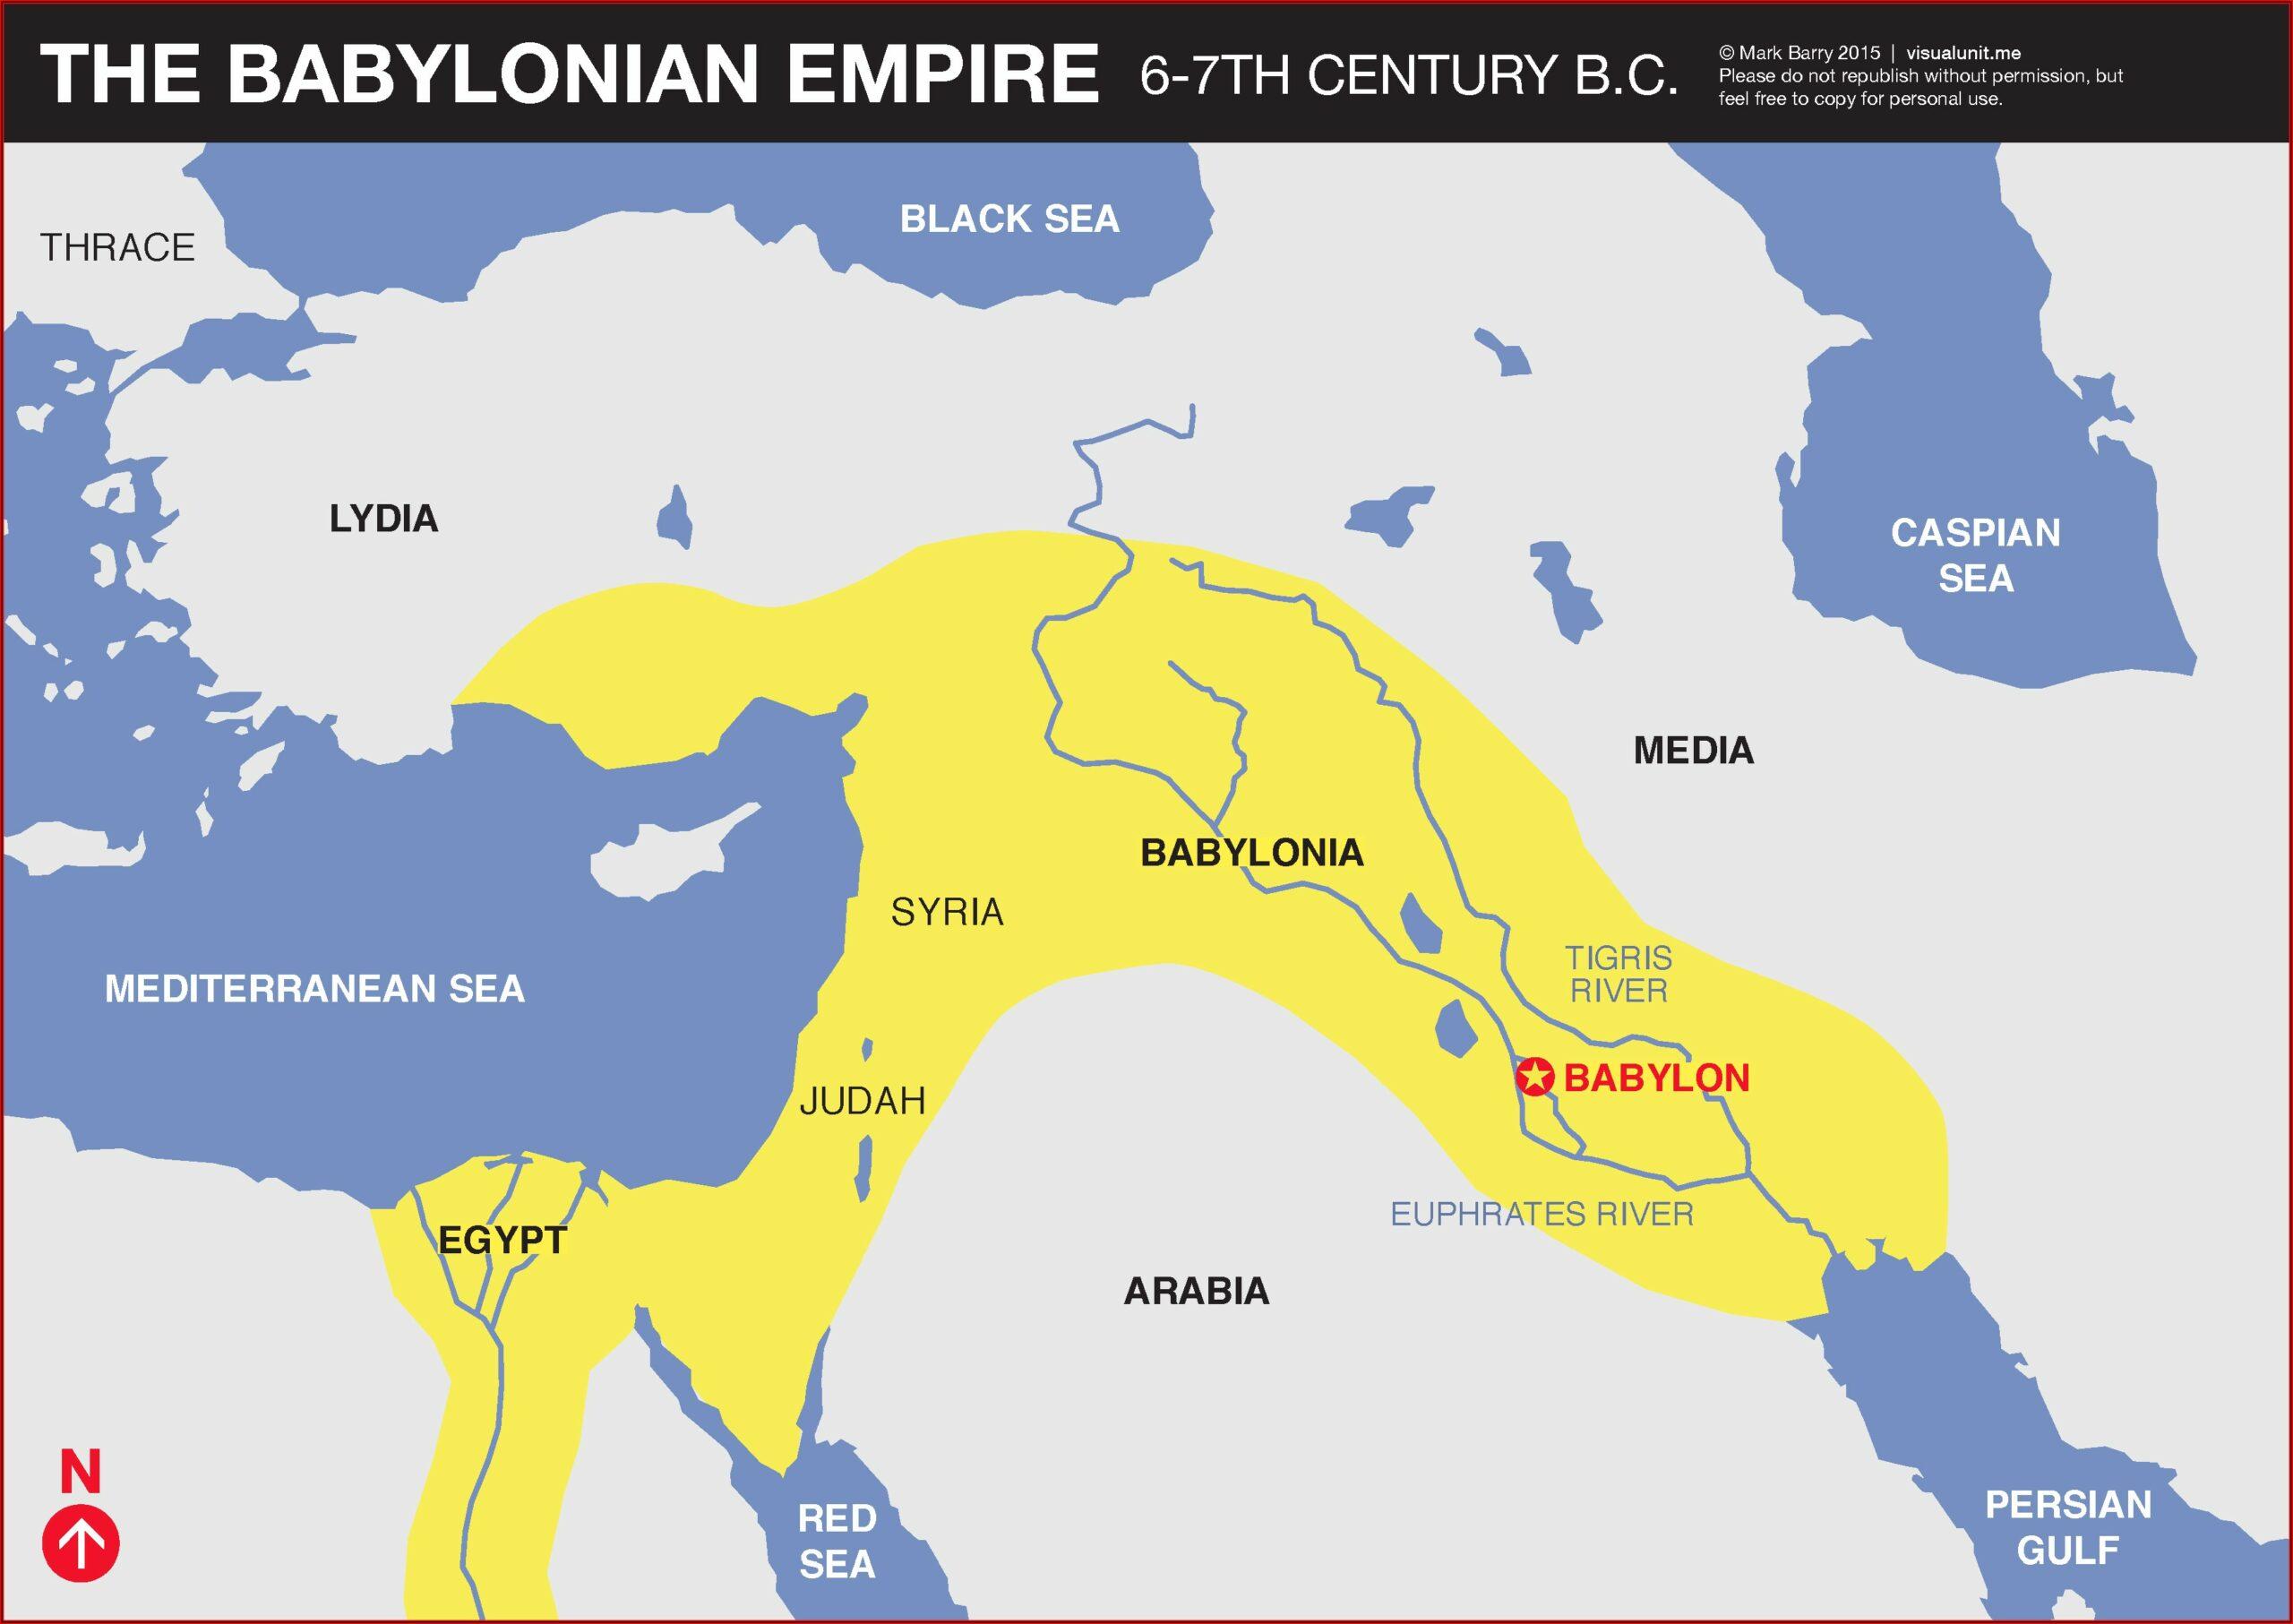 Babylonian Empire Timeline Bible